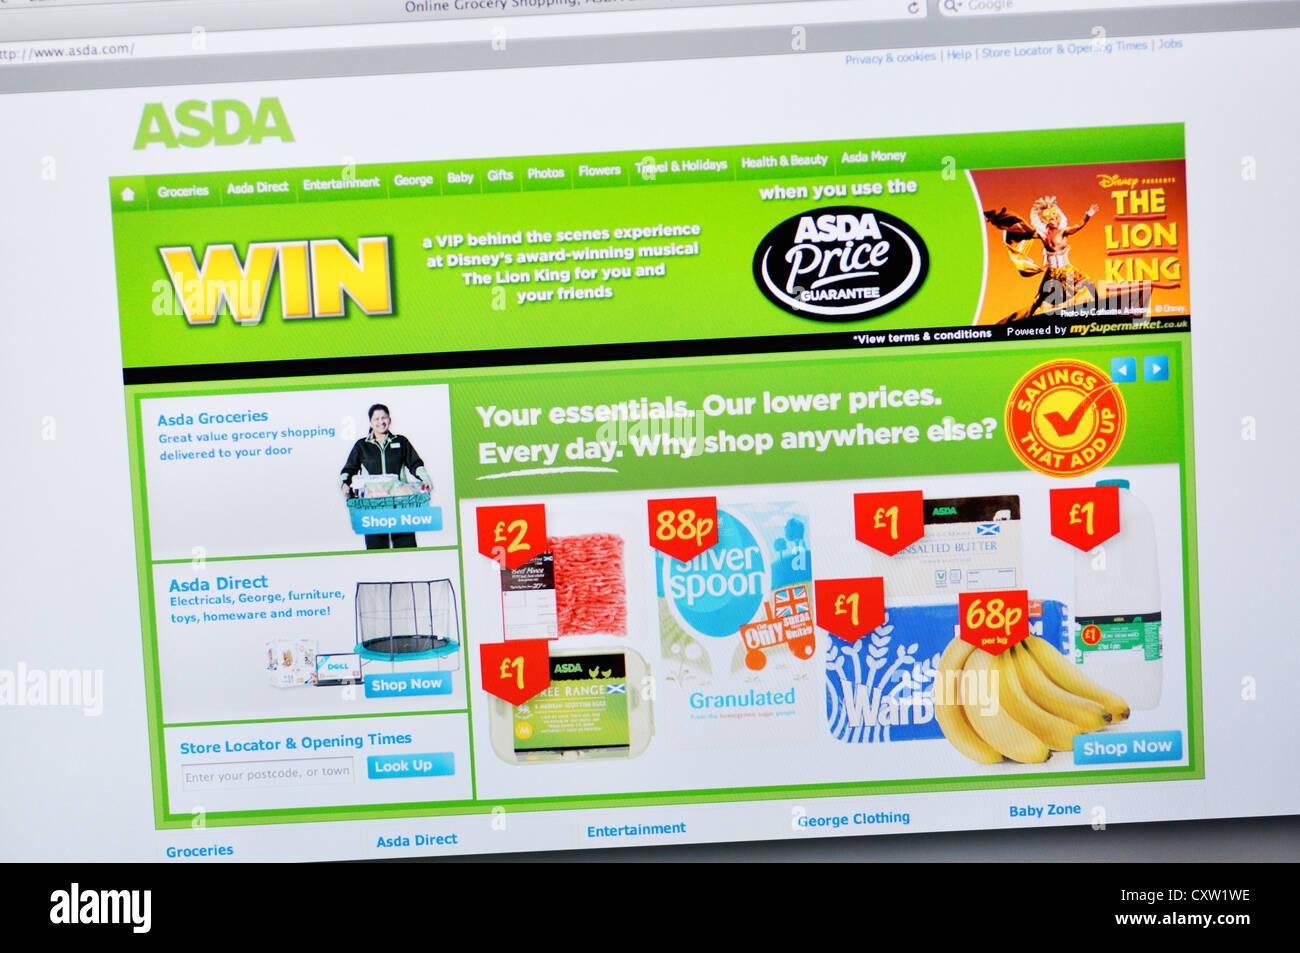 asda direct groceries